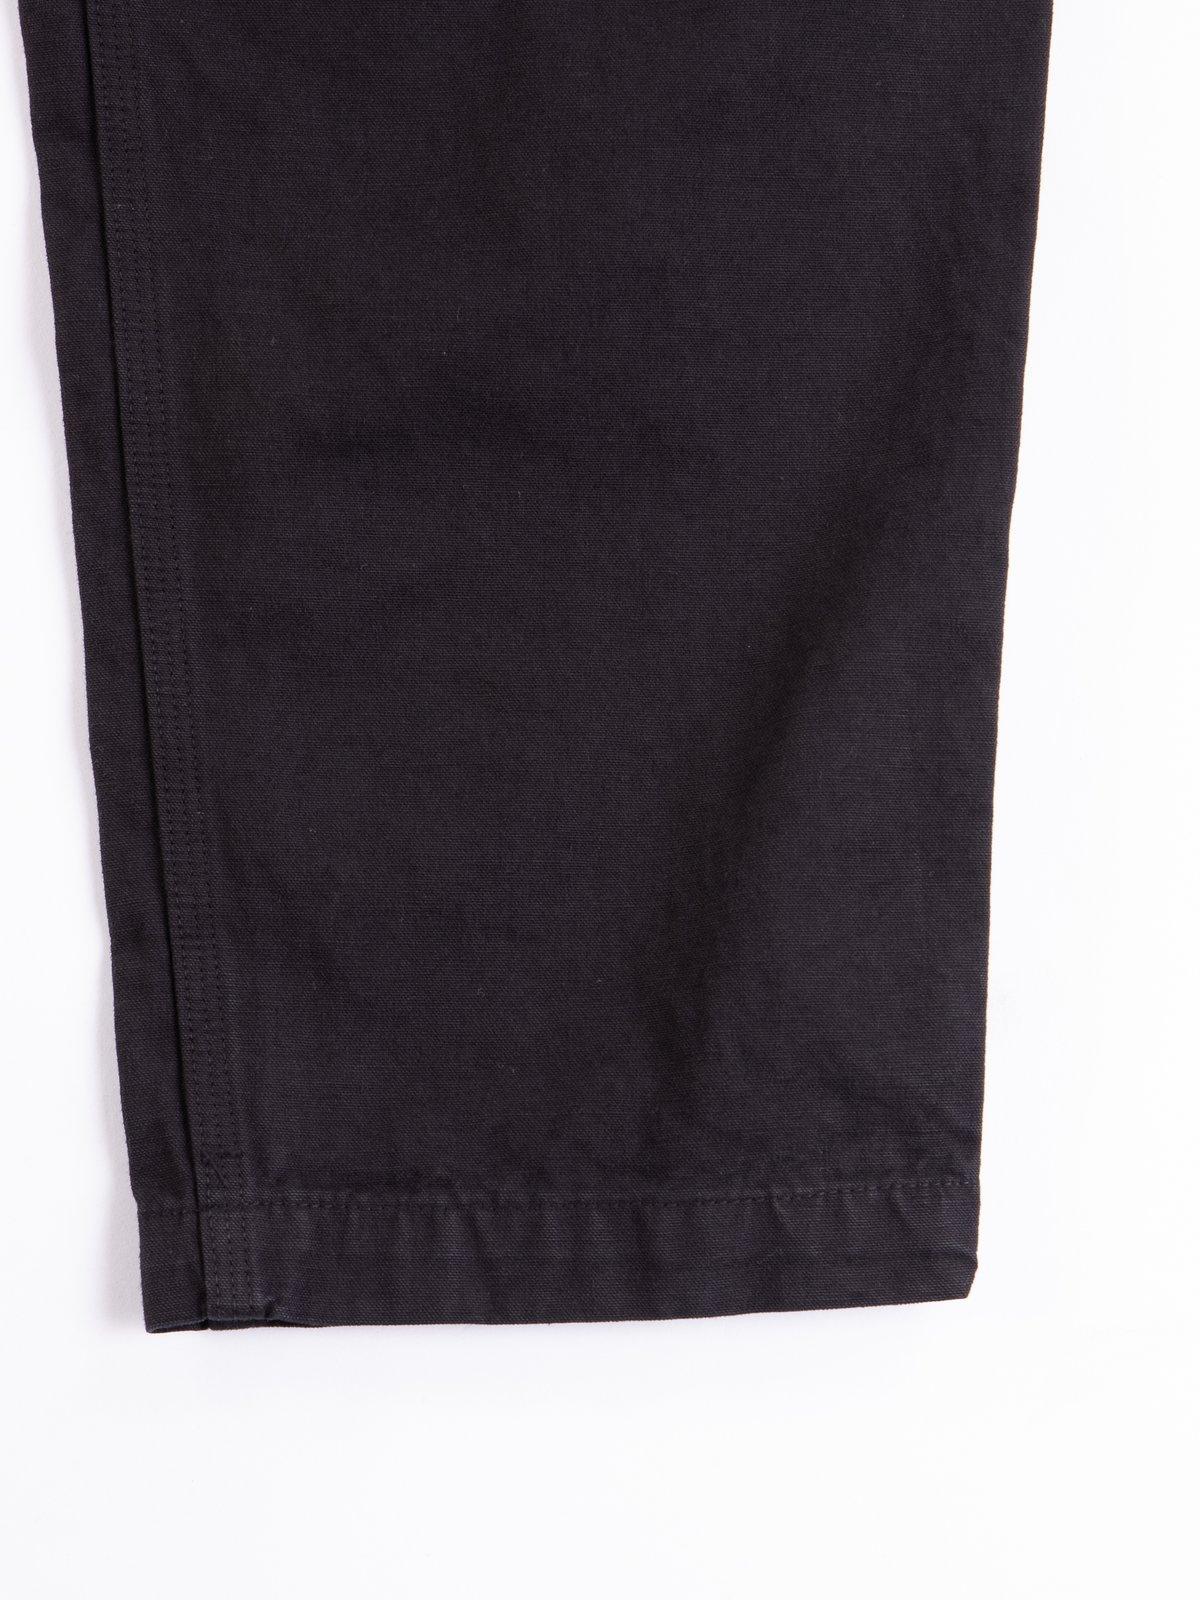 Black Overdyed Canvas TBB Climbing Pant - Image 5